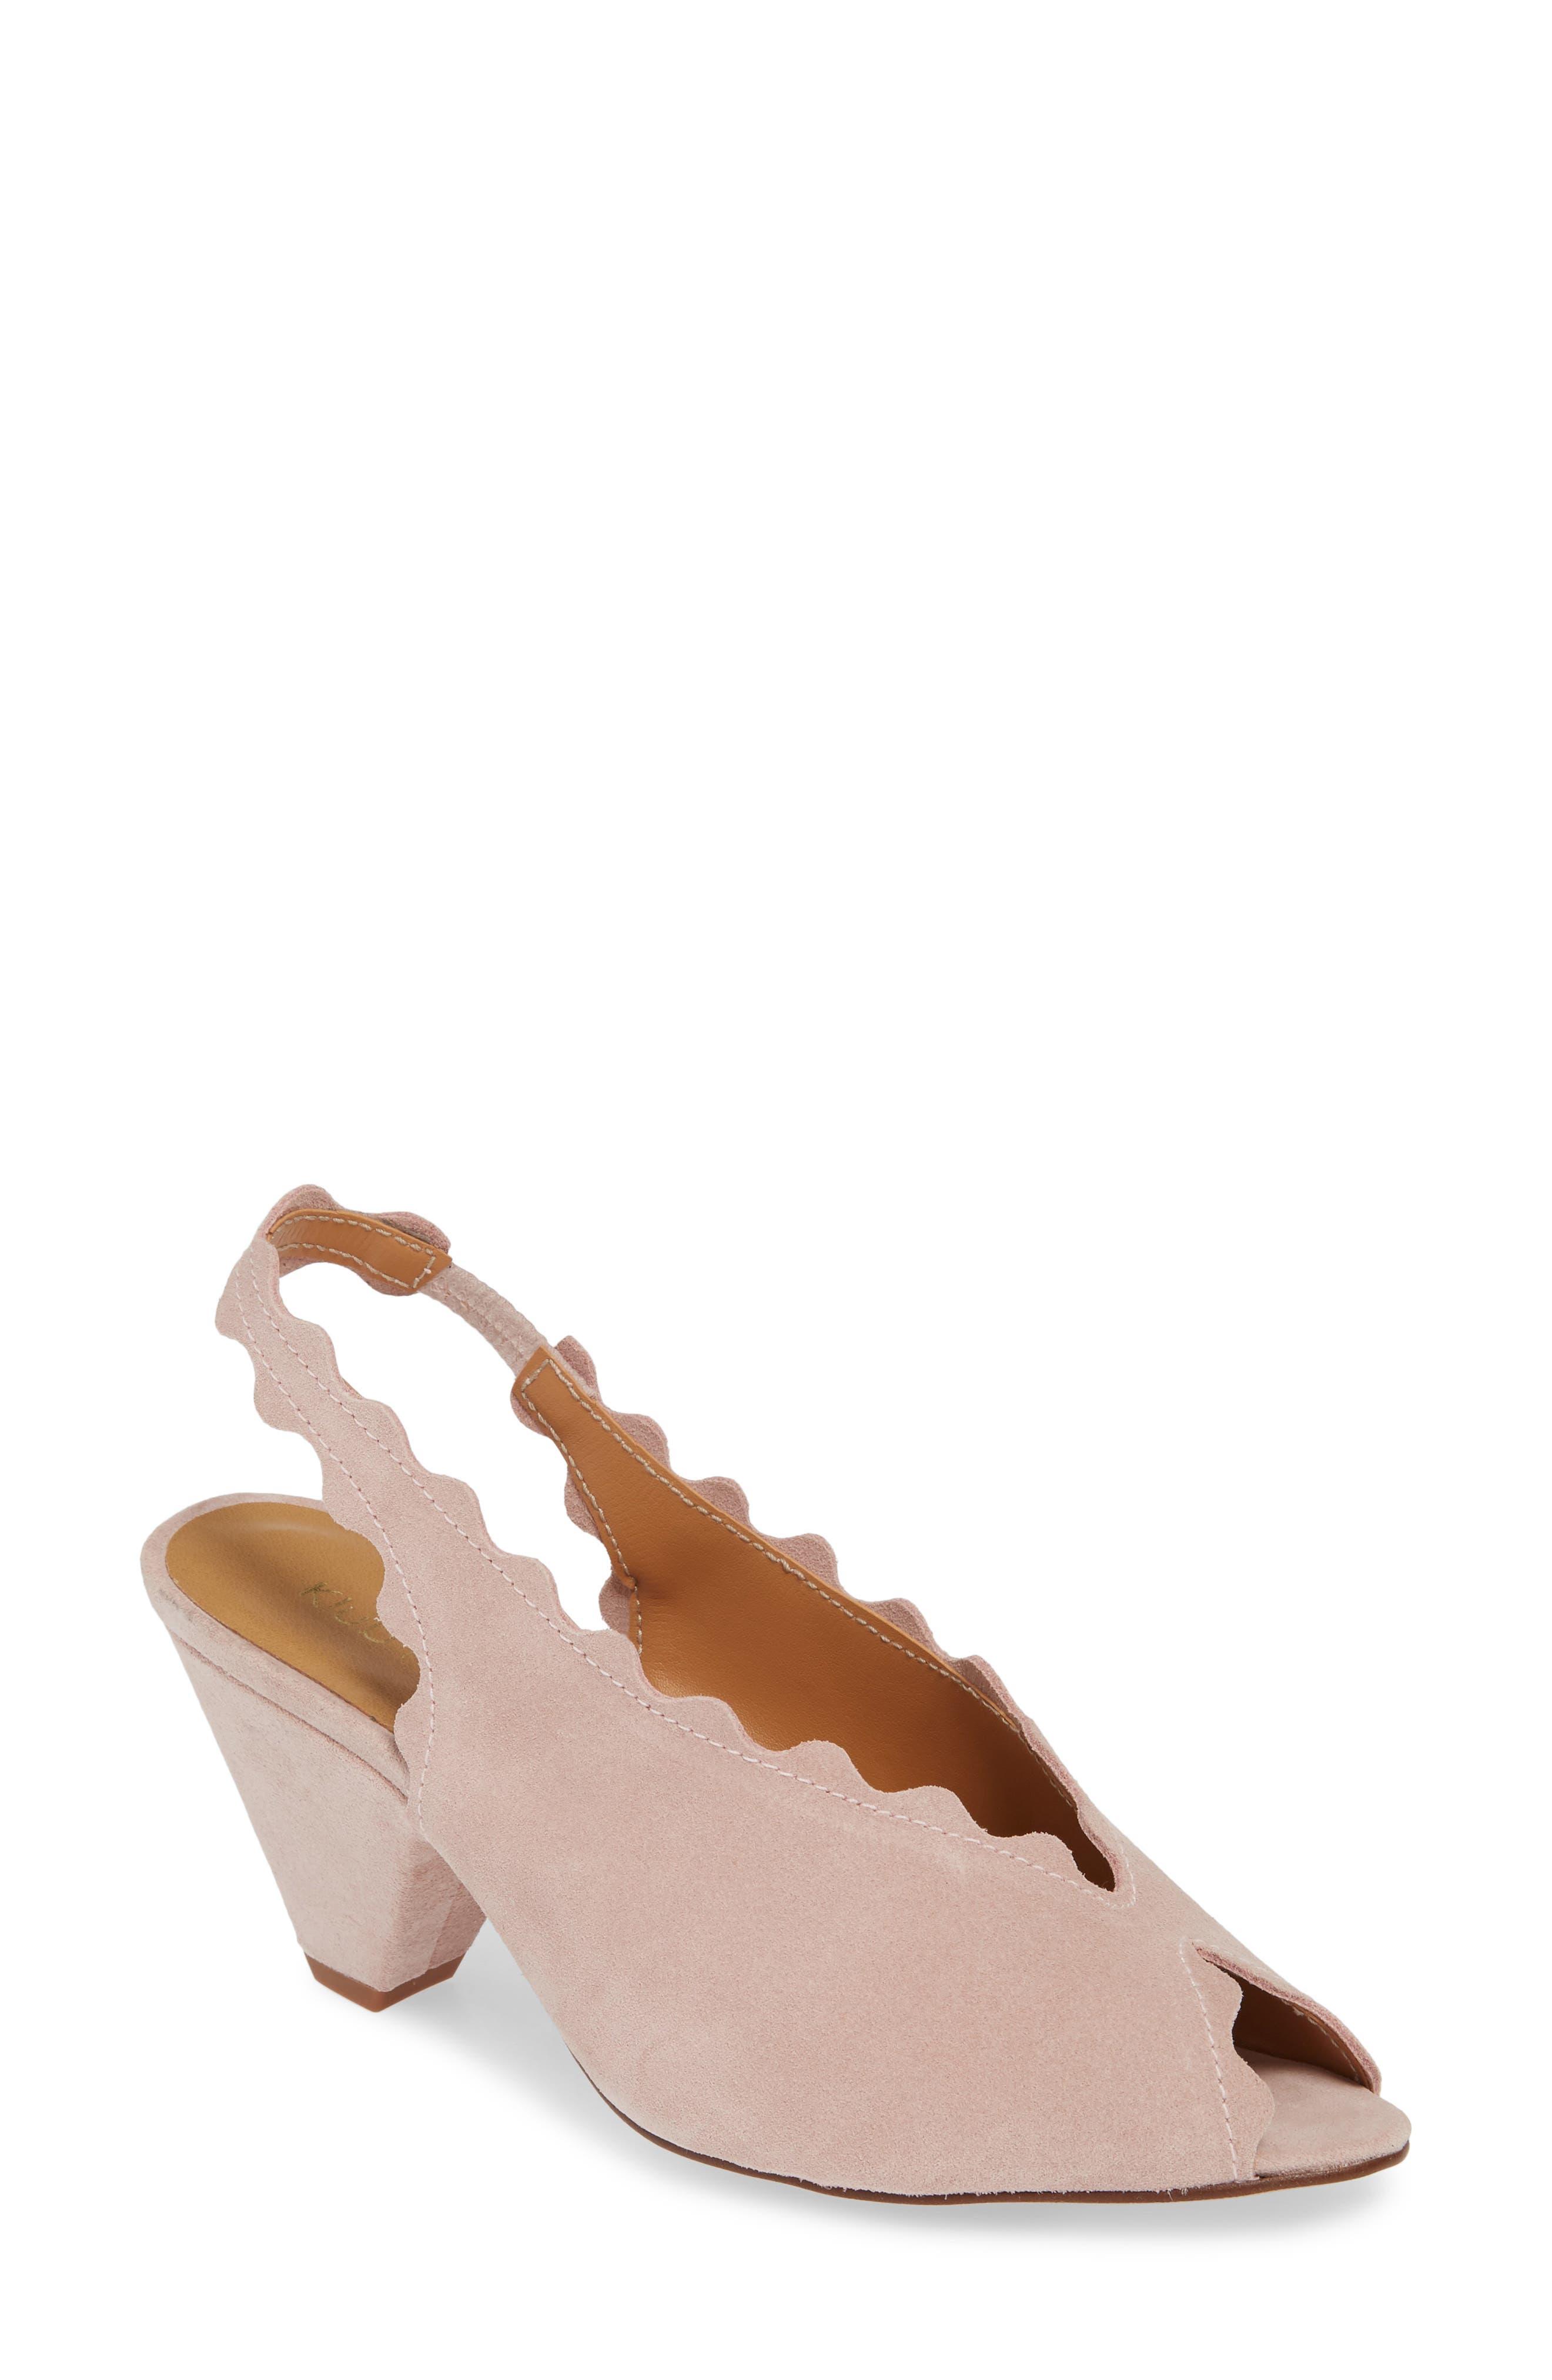 Klub Nico Amelia Scallop Slingback Sandal, Pink